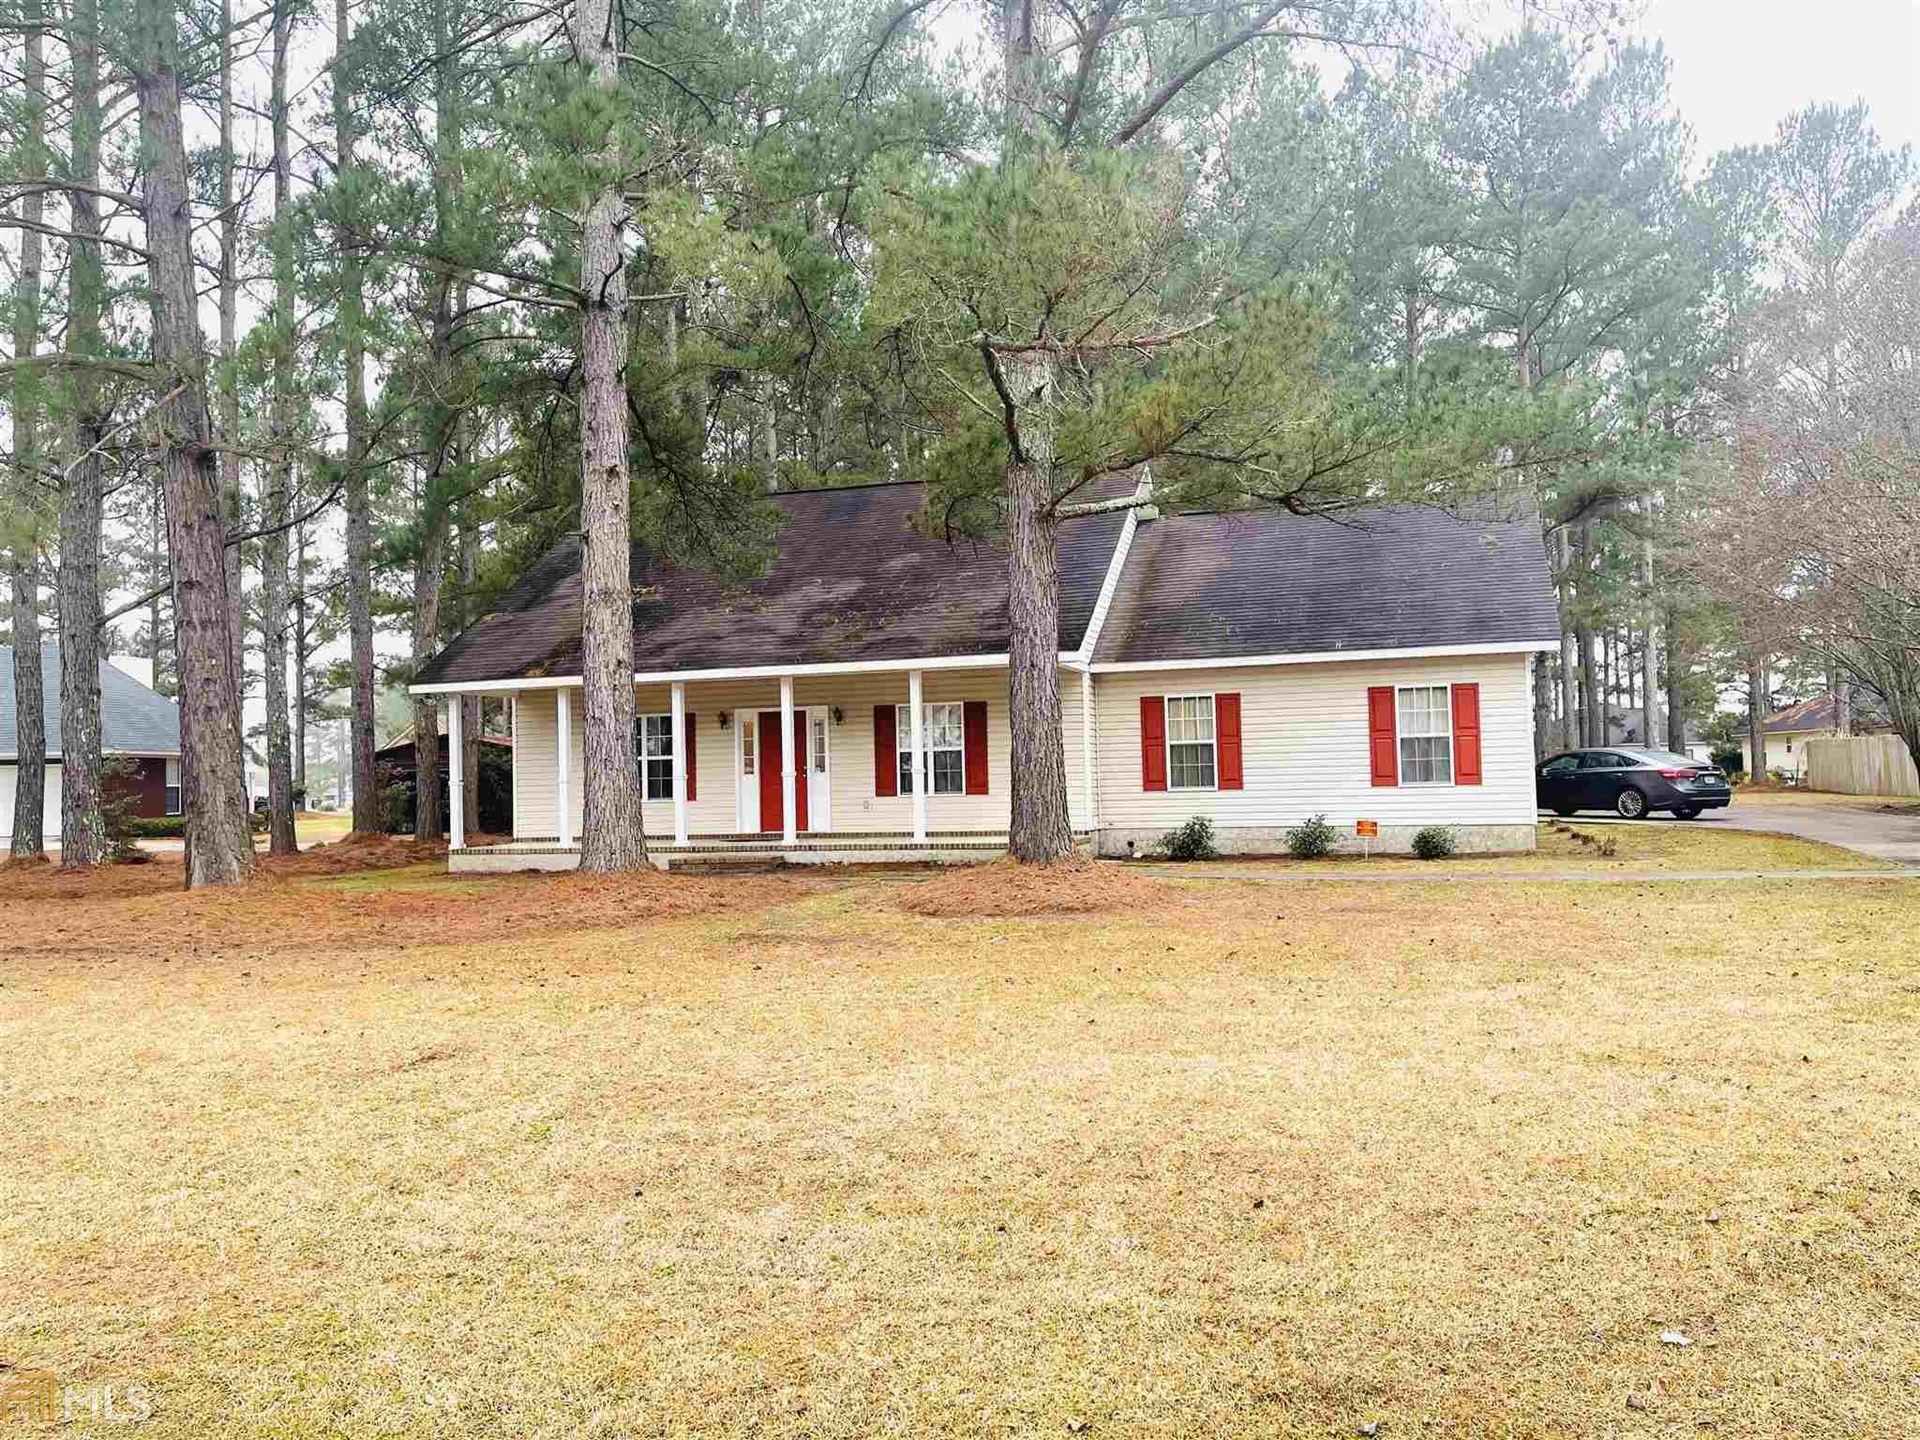 2109 Middleground Plantation Dr, Statesboro, GA 30461 - #: 8924474